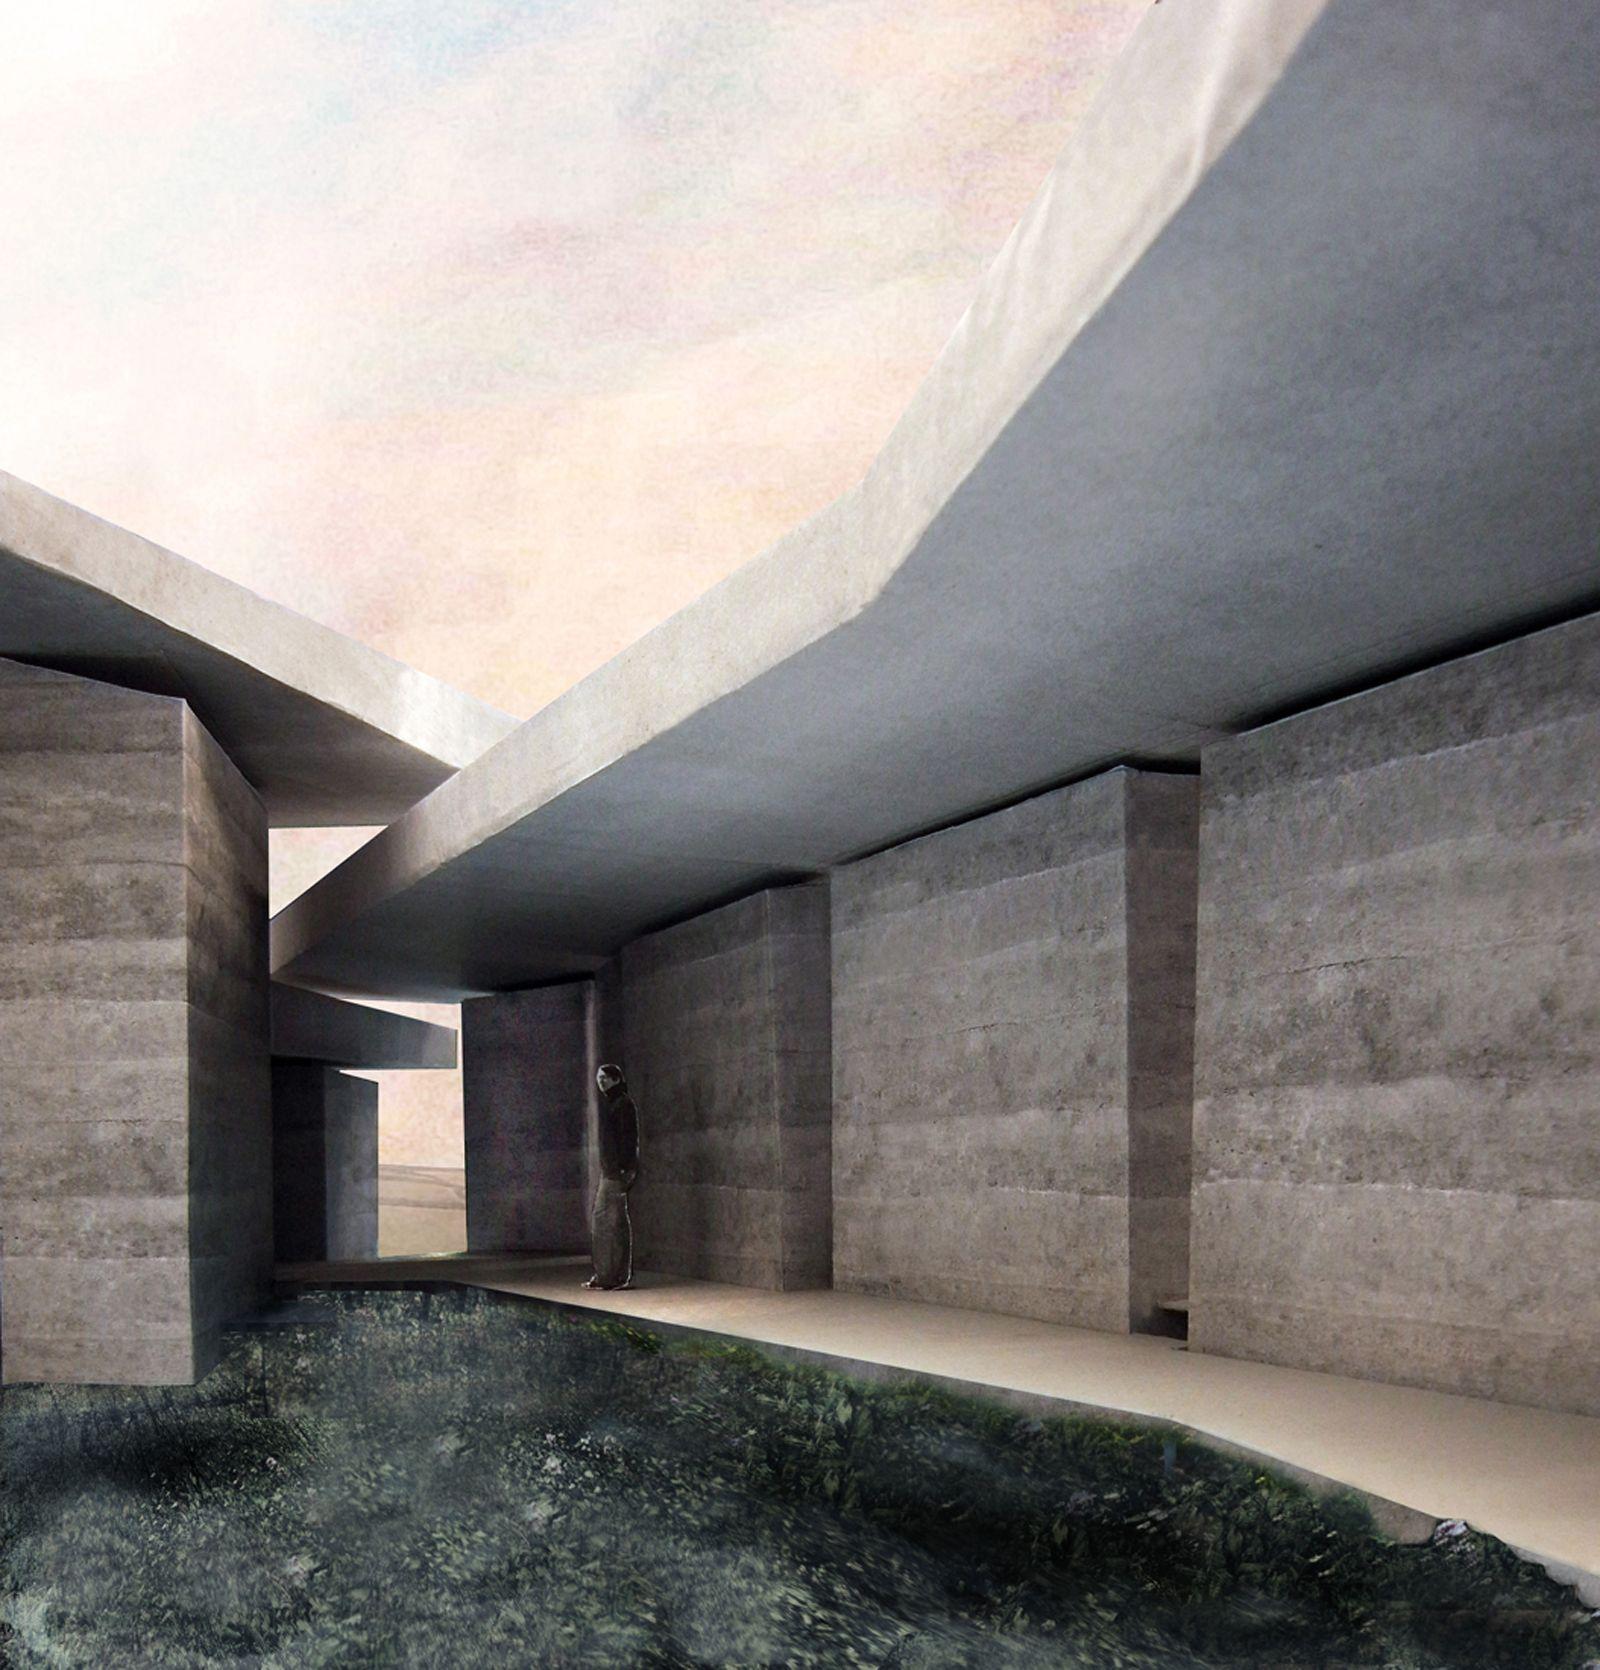 Alain De Botton On Living Architecture In 2020 Beton Architektur